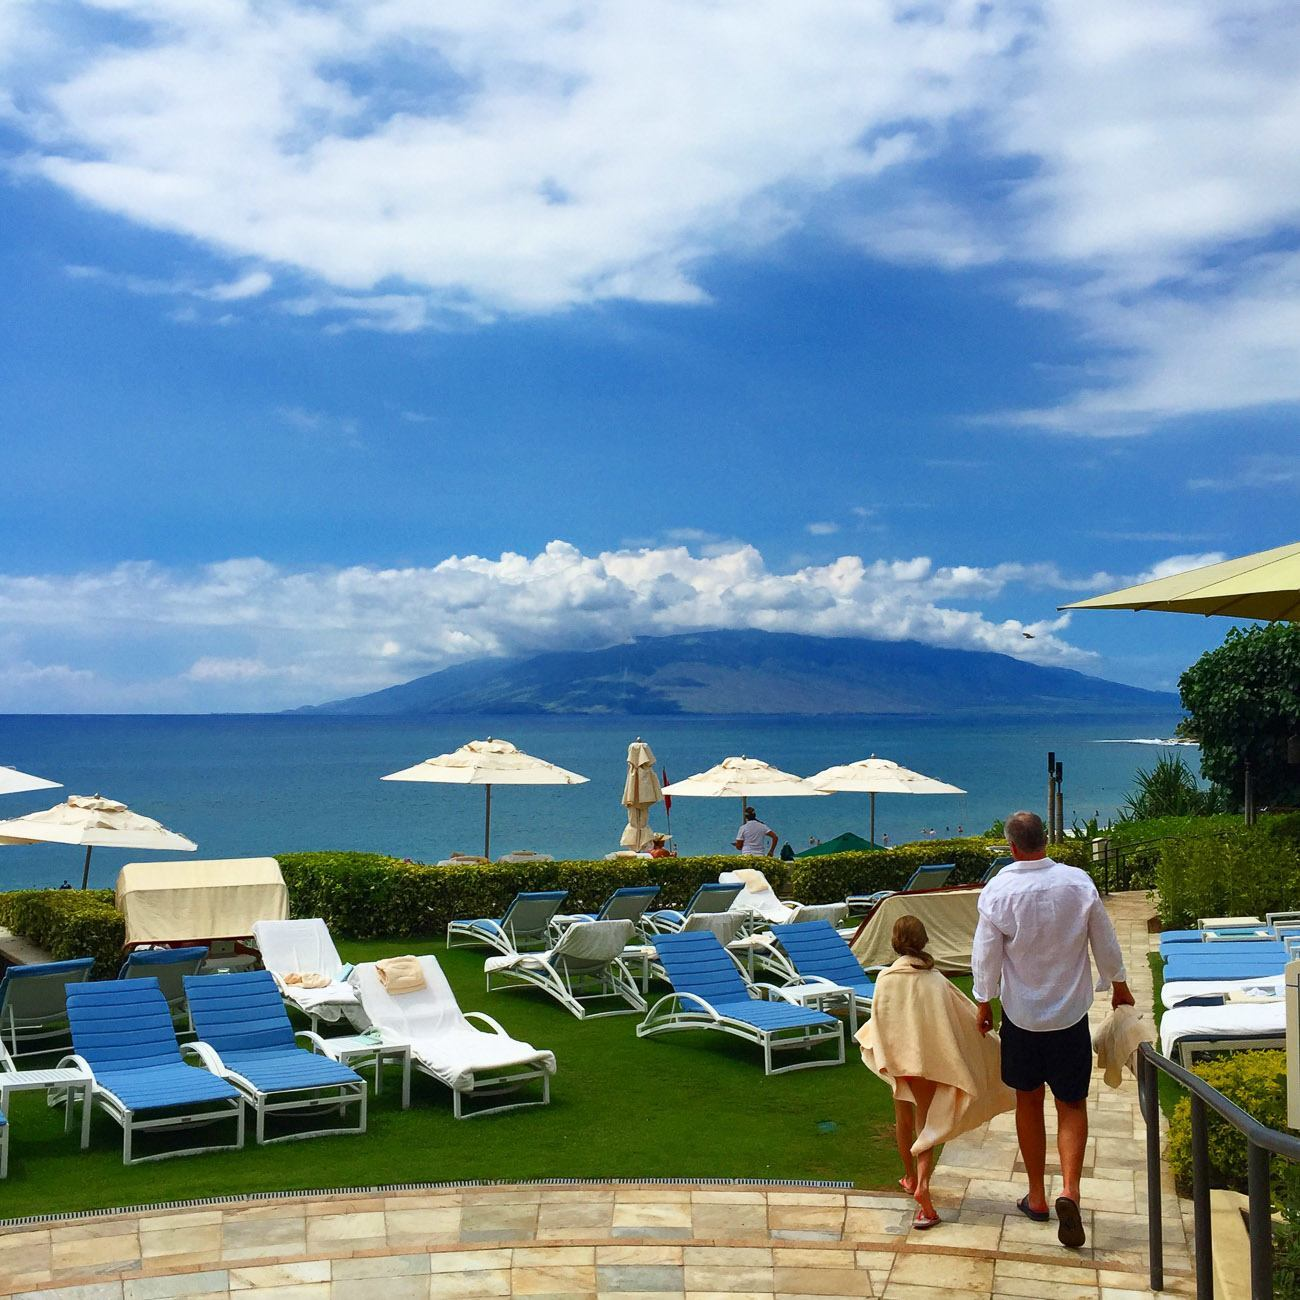 Lounging area near the beach at Four Seasons Resort Maui at Wailea